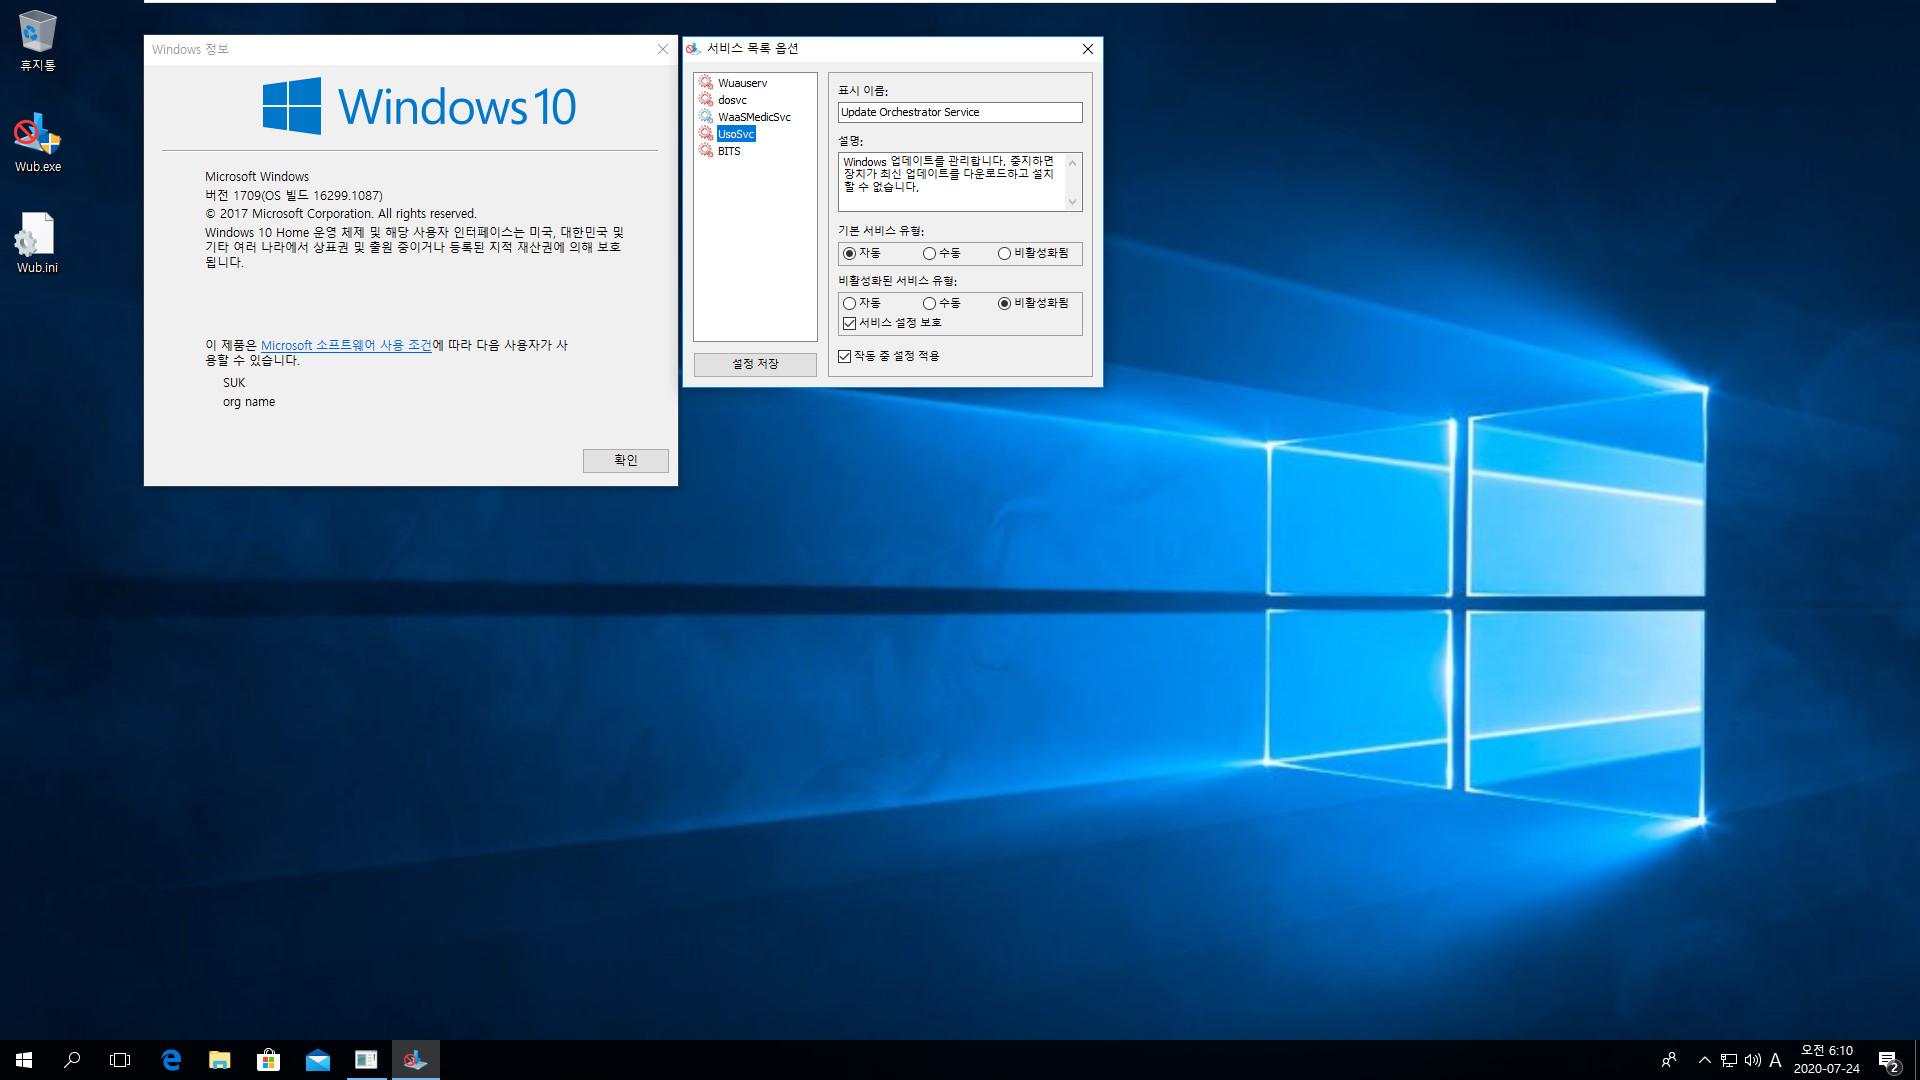 Windows Update Blocker v1.5 업데이트 방지 테스트 - 윈도우는 버전 1709으로 현재 강제 업데이트 중인 버전이고 홈 에디션 2020-07-24_061028.jpg